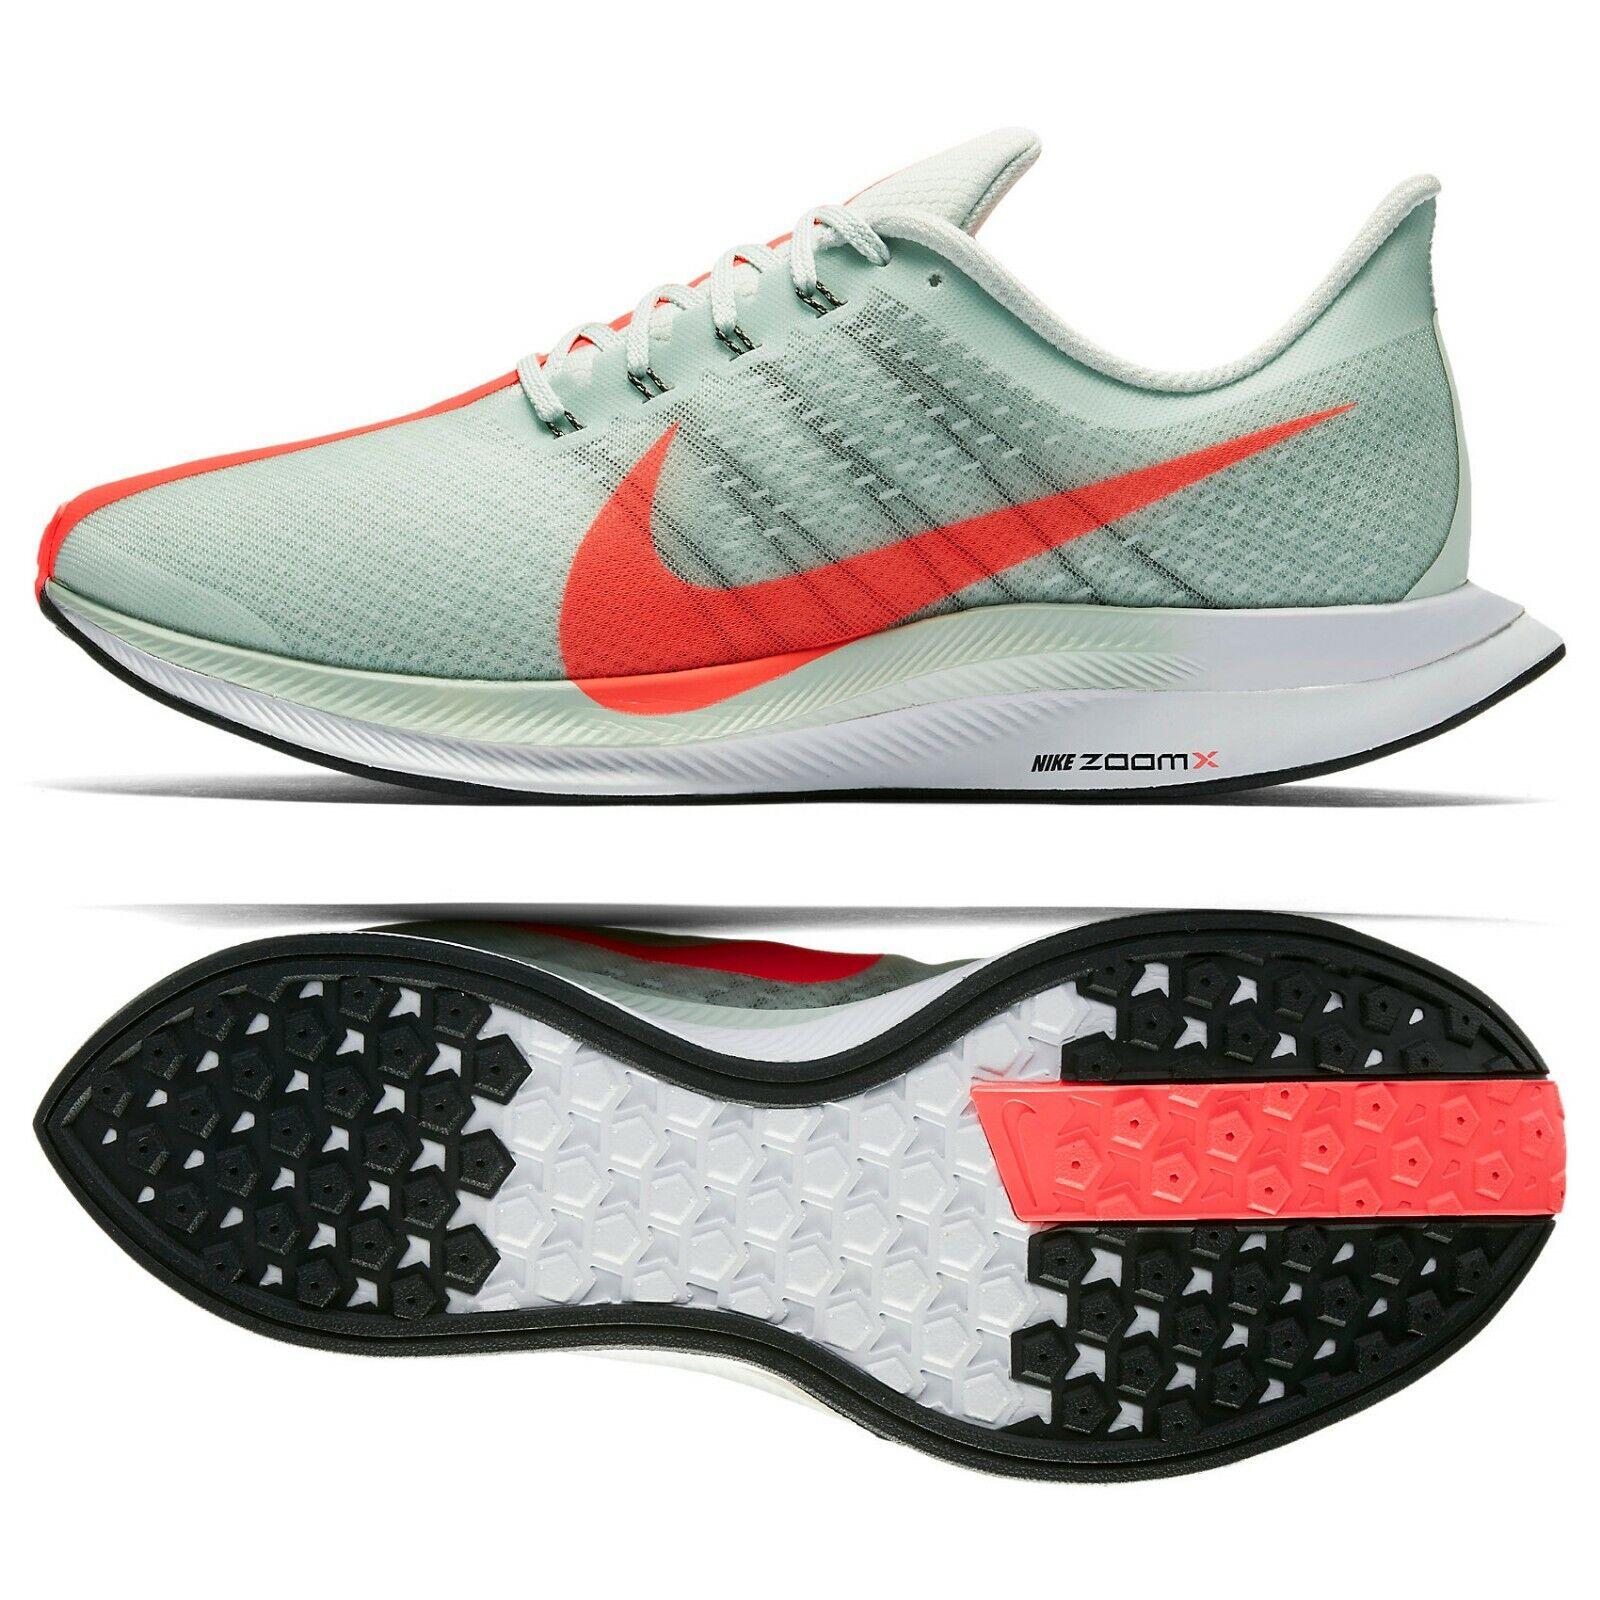 Nike Zoom Pegasus Turbo AJ4114-060 Barely Grey Hot Punch Black Men's shoes Sz 15